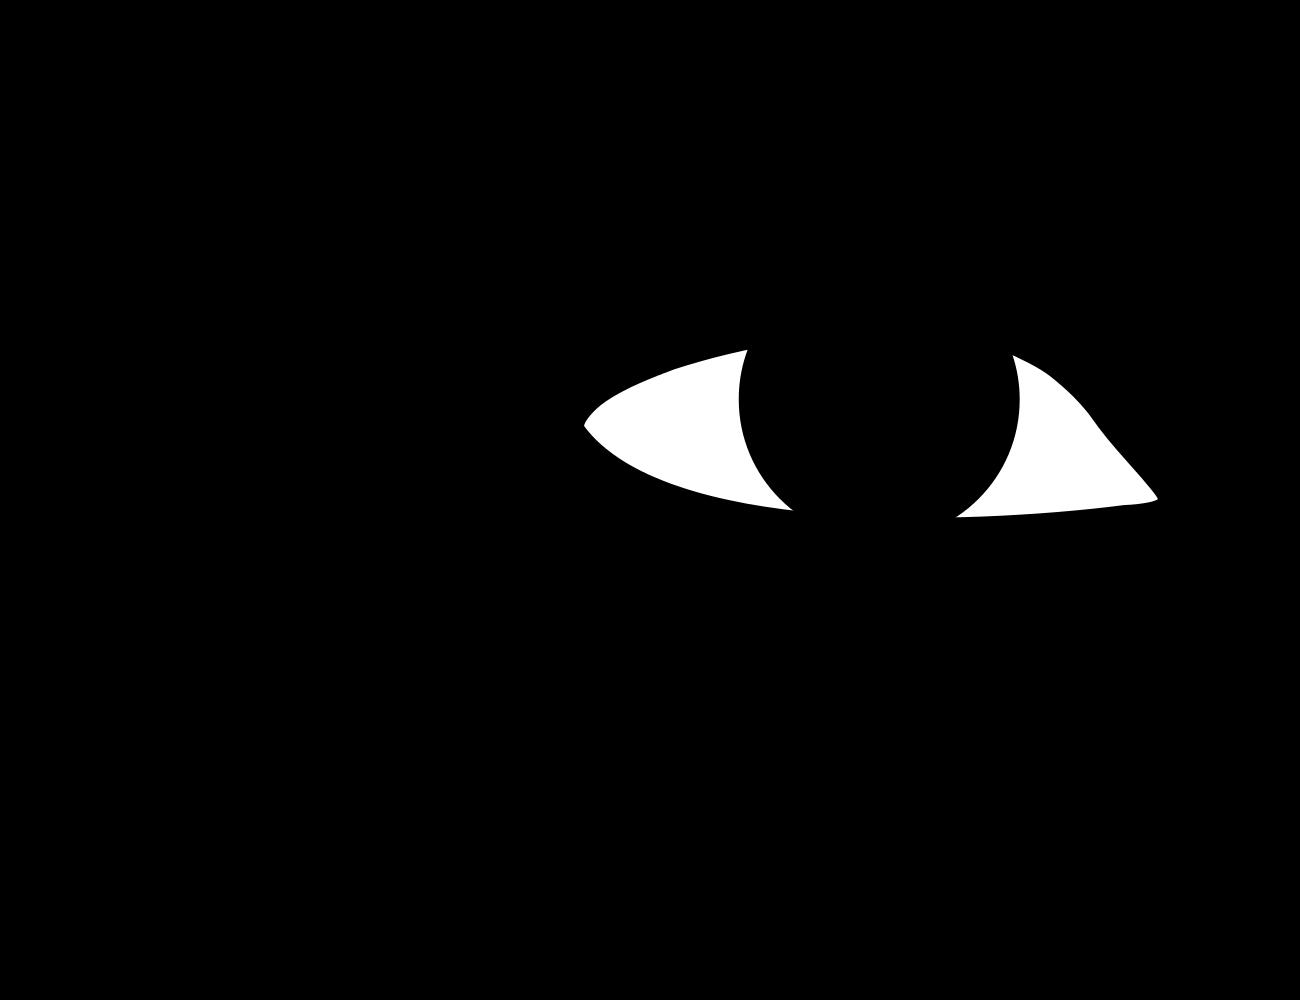 Eye Of Horus Eye Of Horus Horus Tattoo Egypt Tattoo